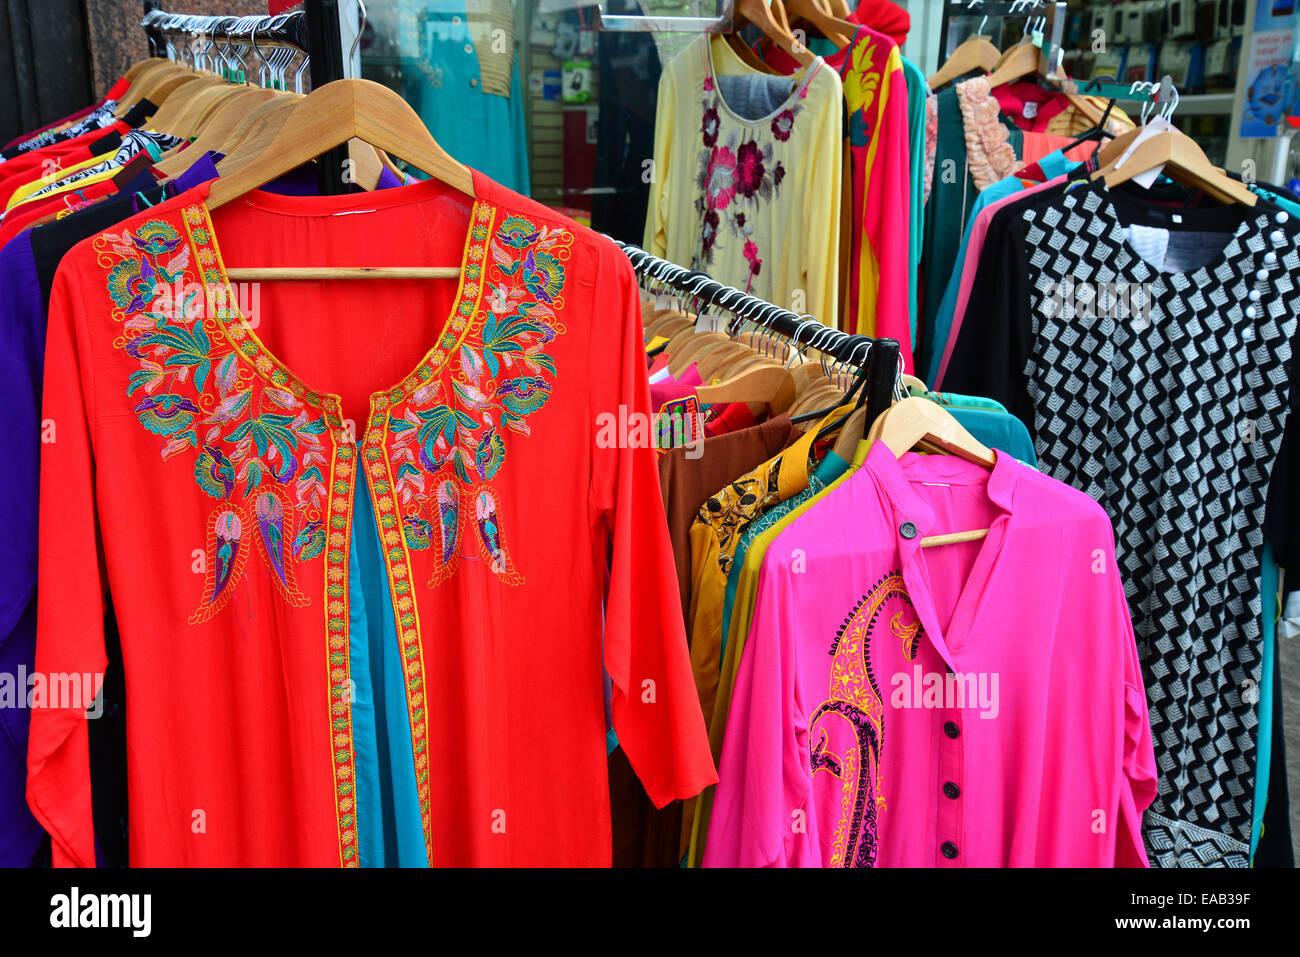 Indian Clothes Stock Photos Indian Clothes Stock Images Alamy